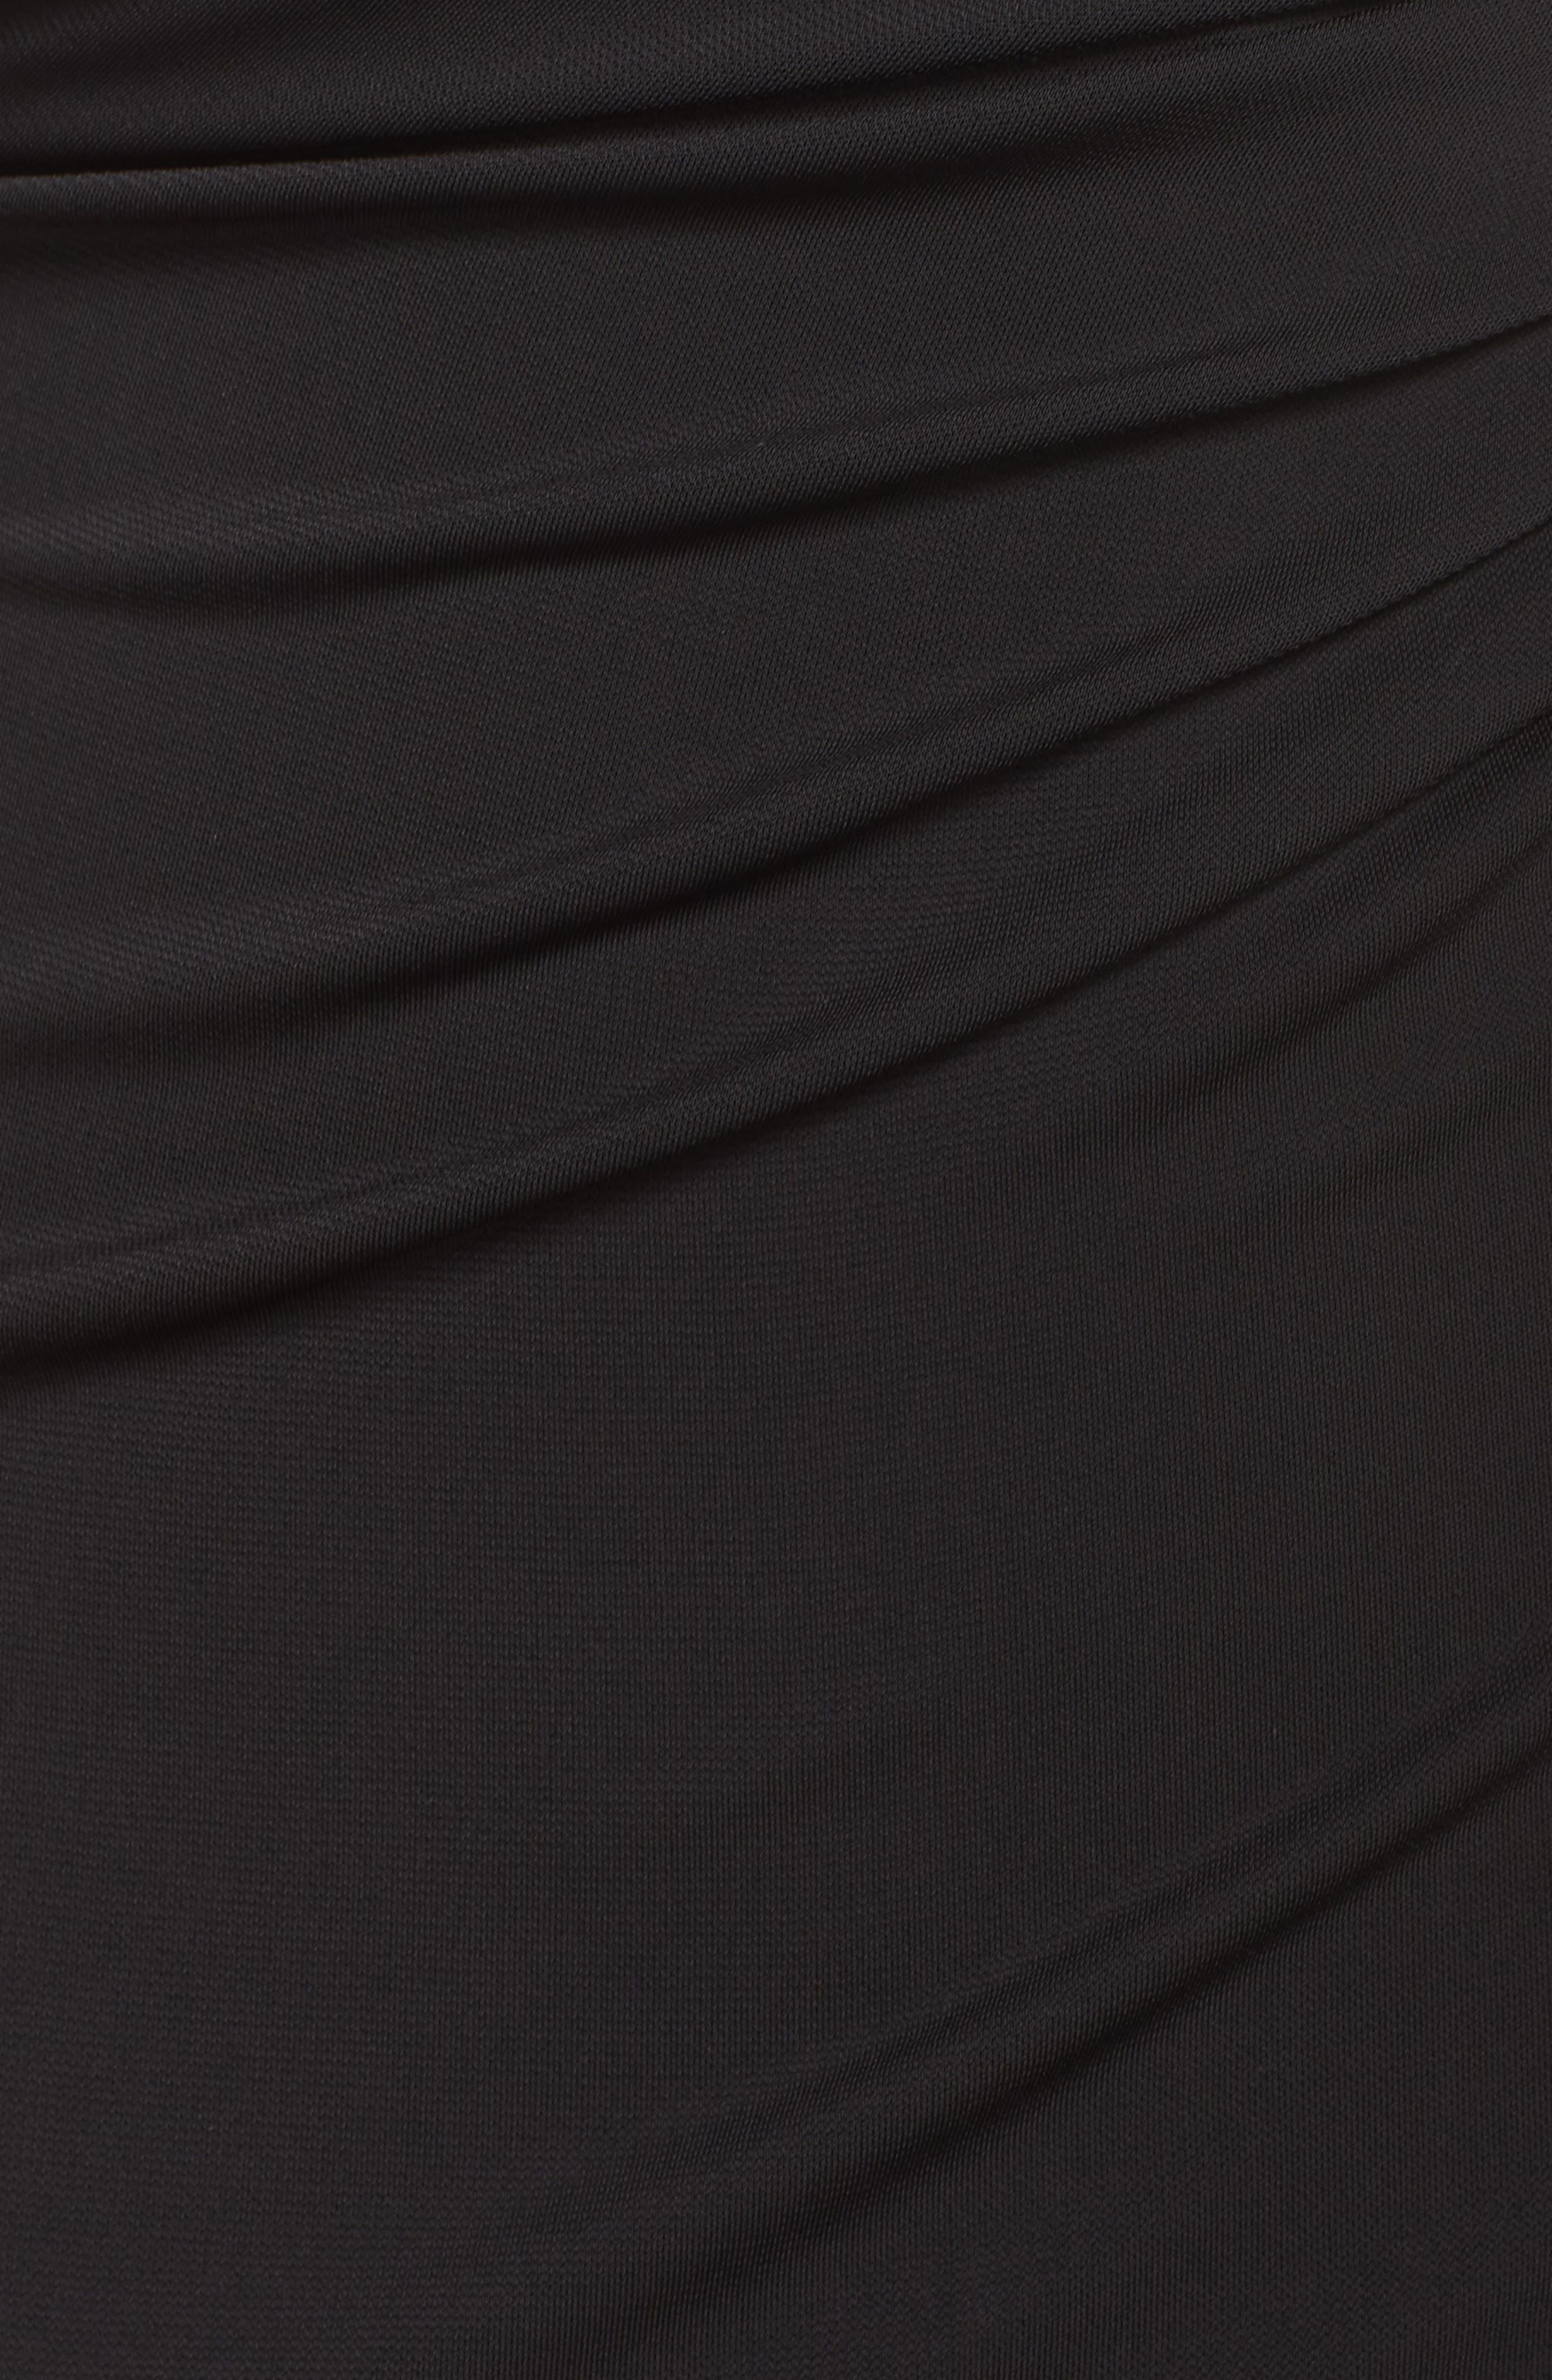 Kerri One-Shoulder Gown,                             Alternate thumbnail 5, color,